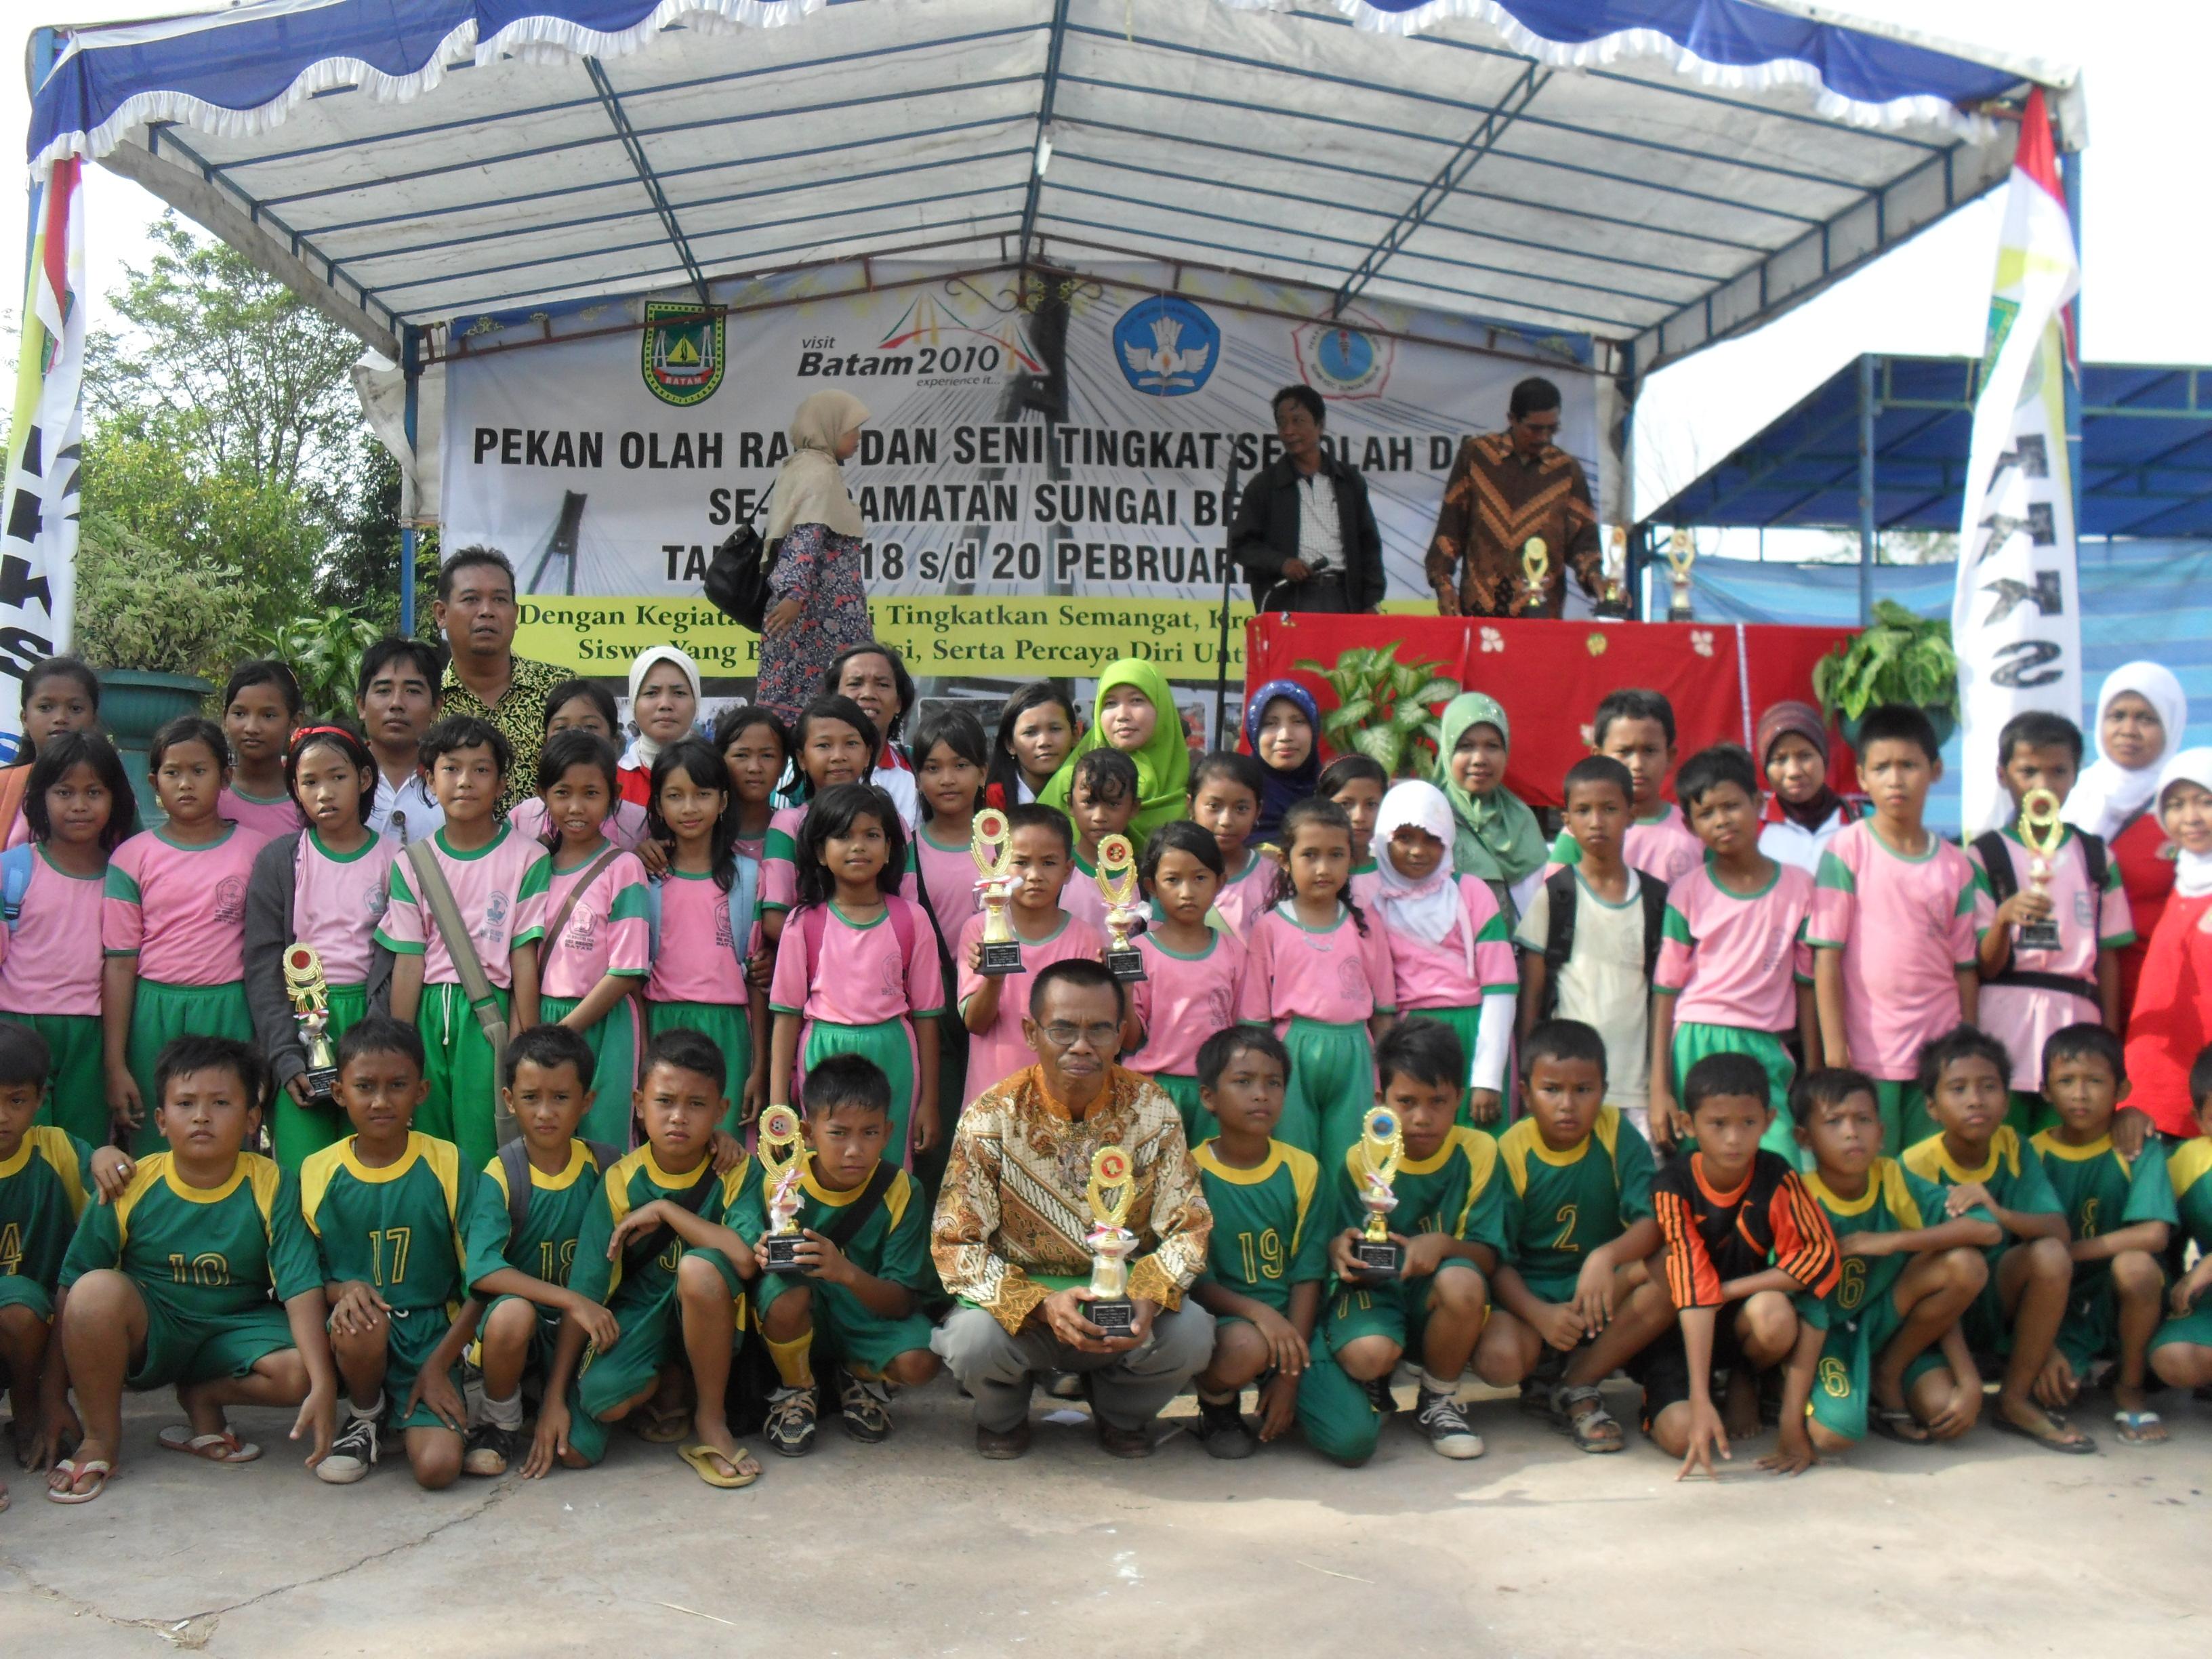 Pemenang Lomba Porseni Tk Kecamatan Th 2009 2010 Kepsek Saiman Atm Amati Teliti Dan